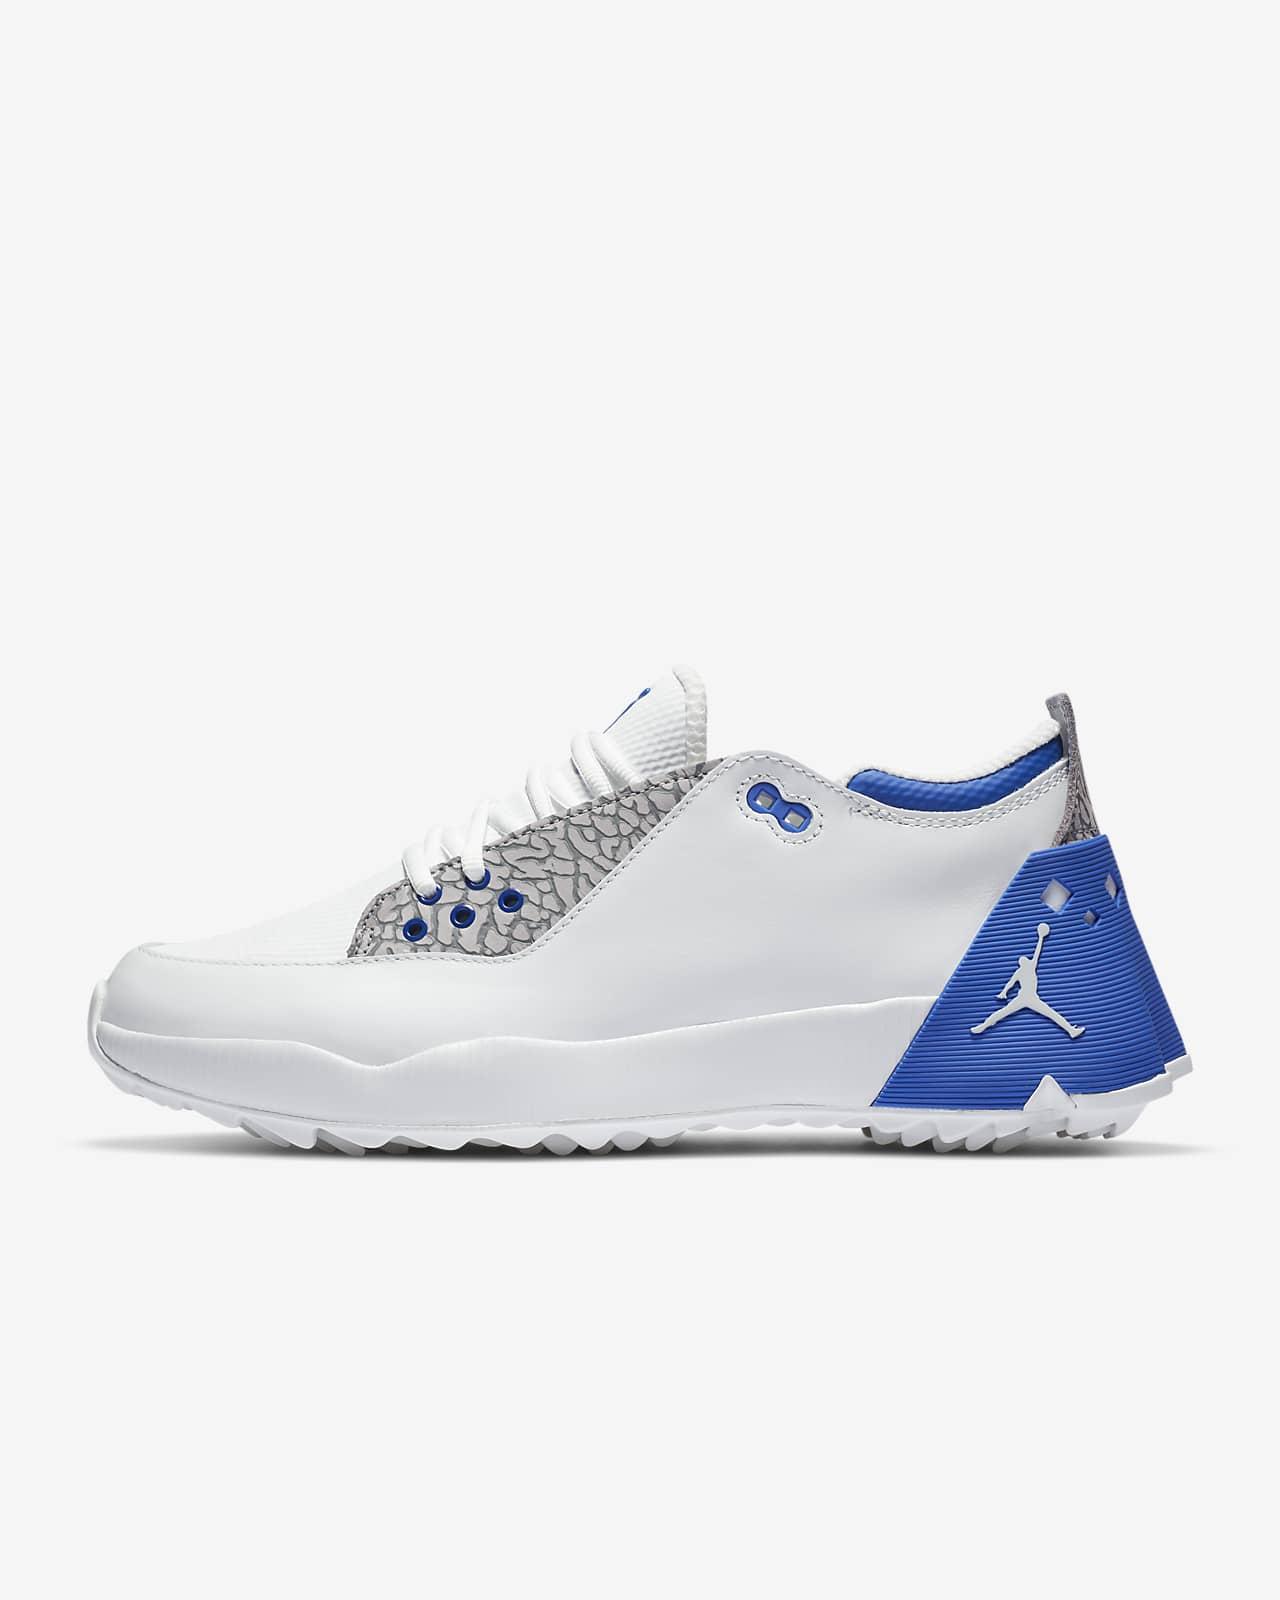 Jordan ADG 2 Men's Golf Shoe. Nike AE